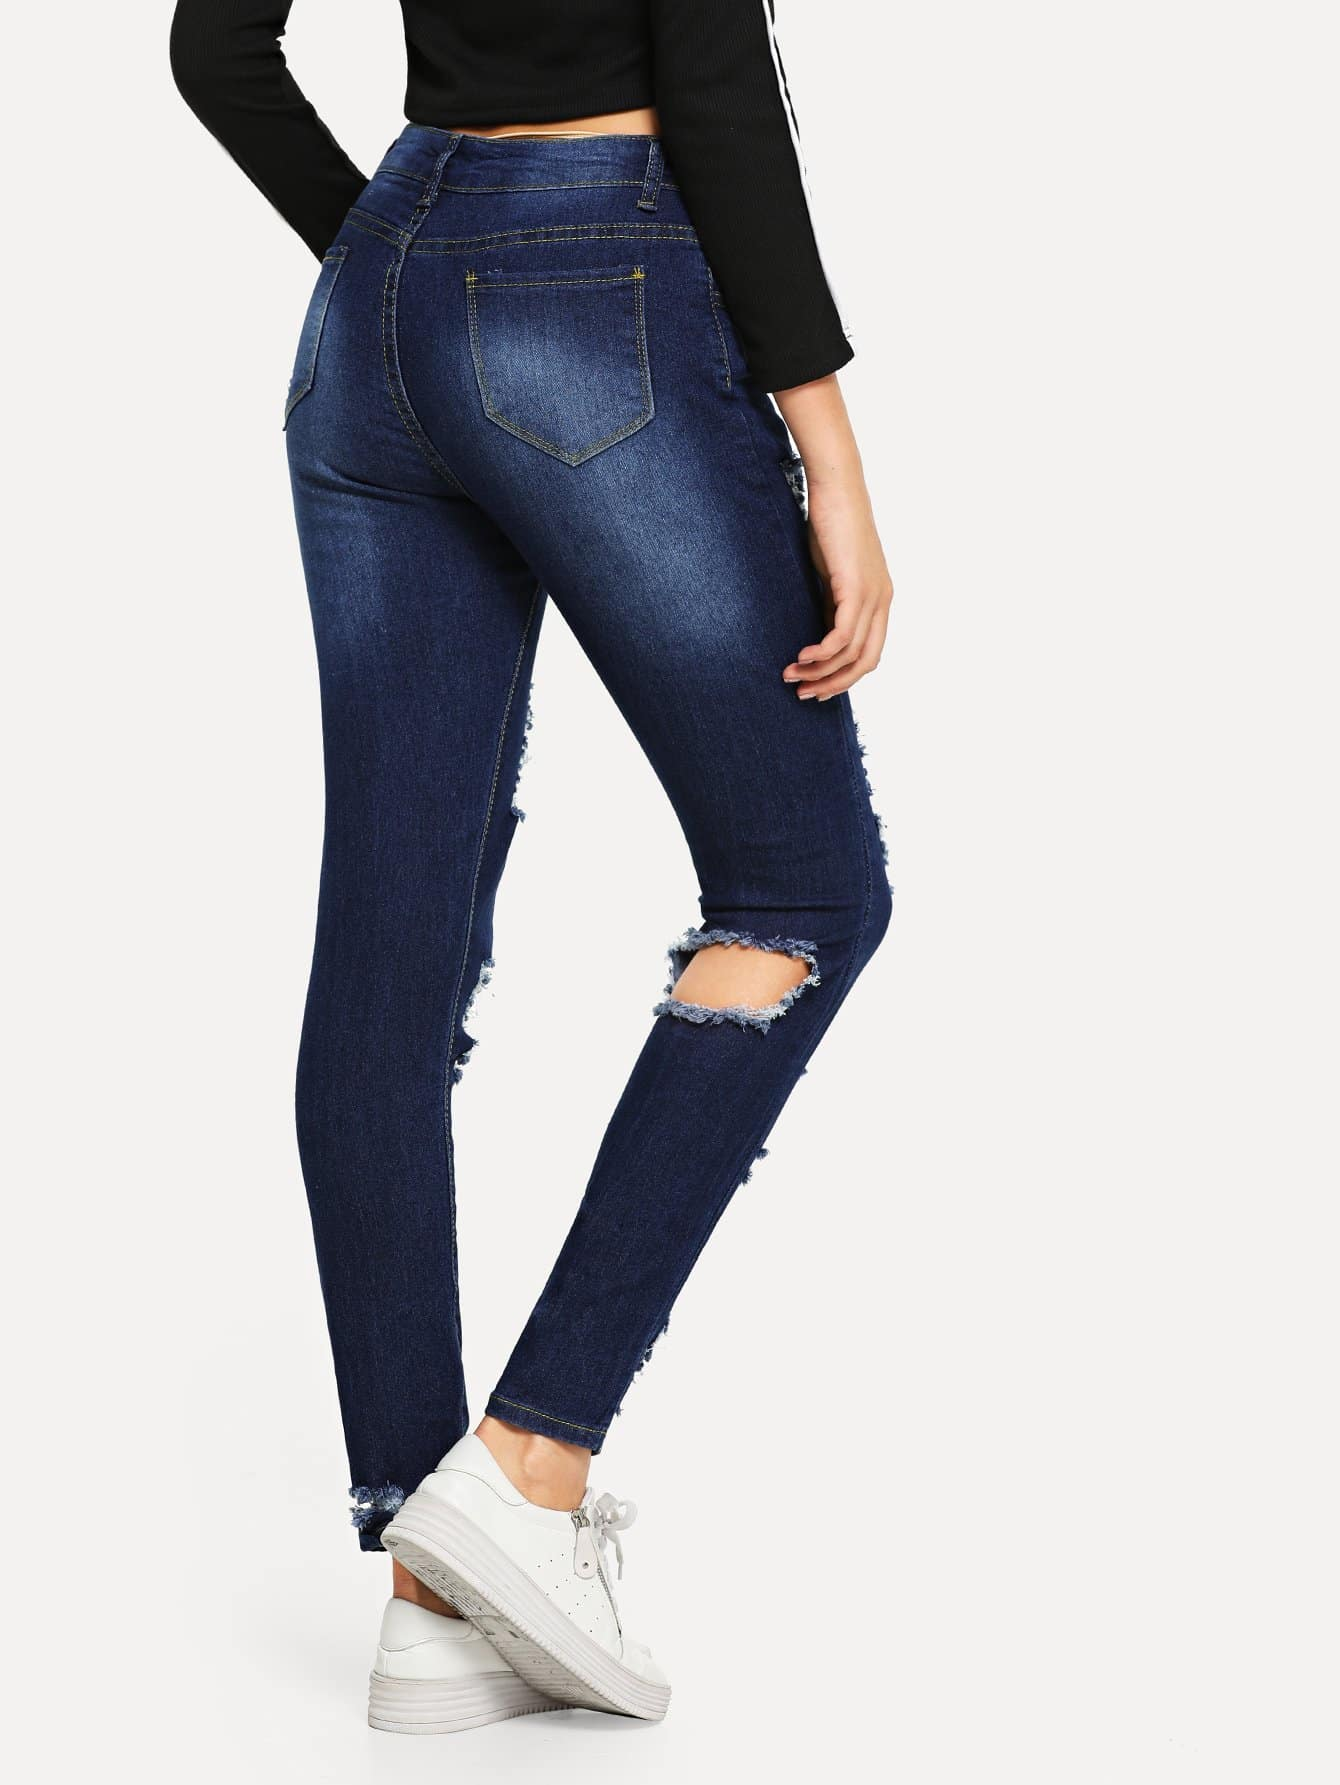 zerrissene schmale jeans shein. Black Bedroom Furniture Sets. Home Design Ideas